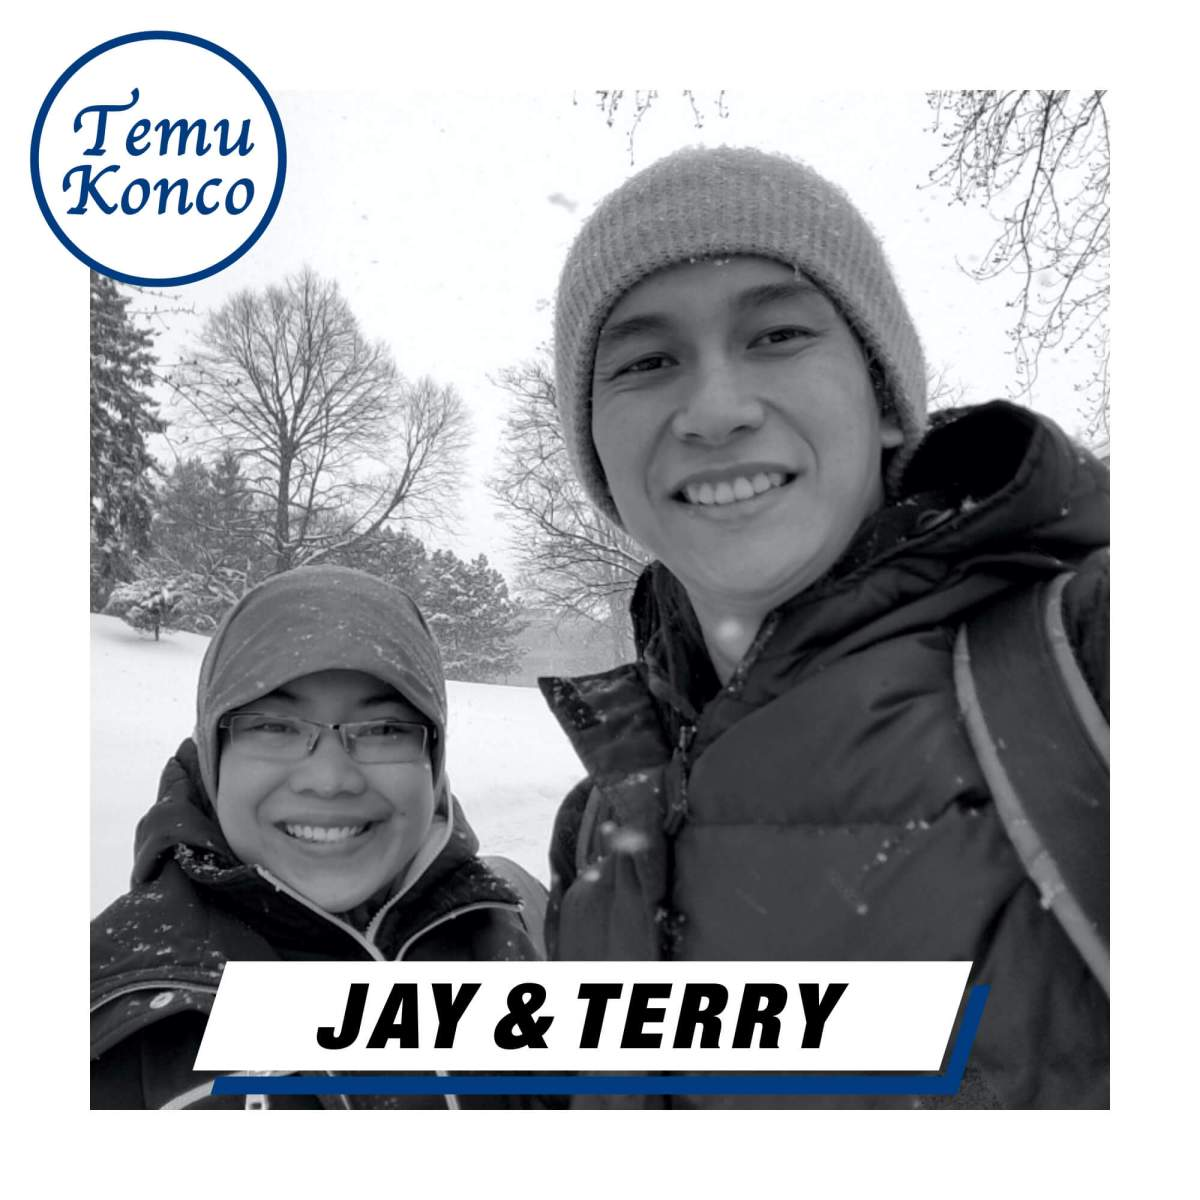 TemuKonco Podcast Eps. 02 Jay & Terry - Ramadhan dan Idul Fitri di Luar Negeri